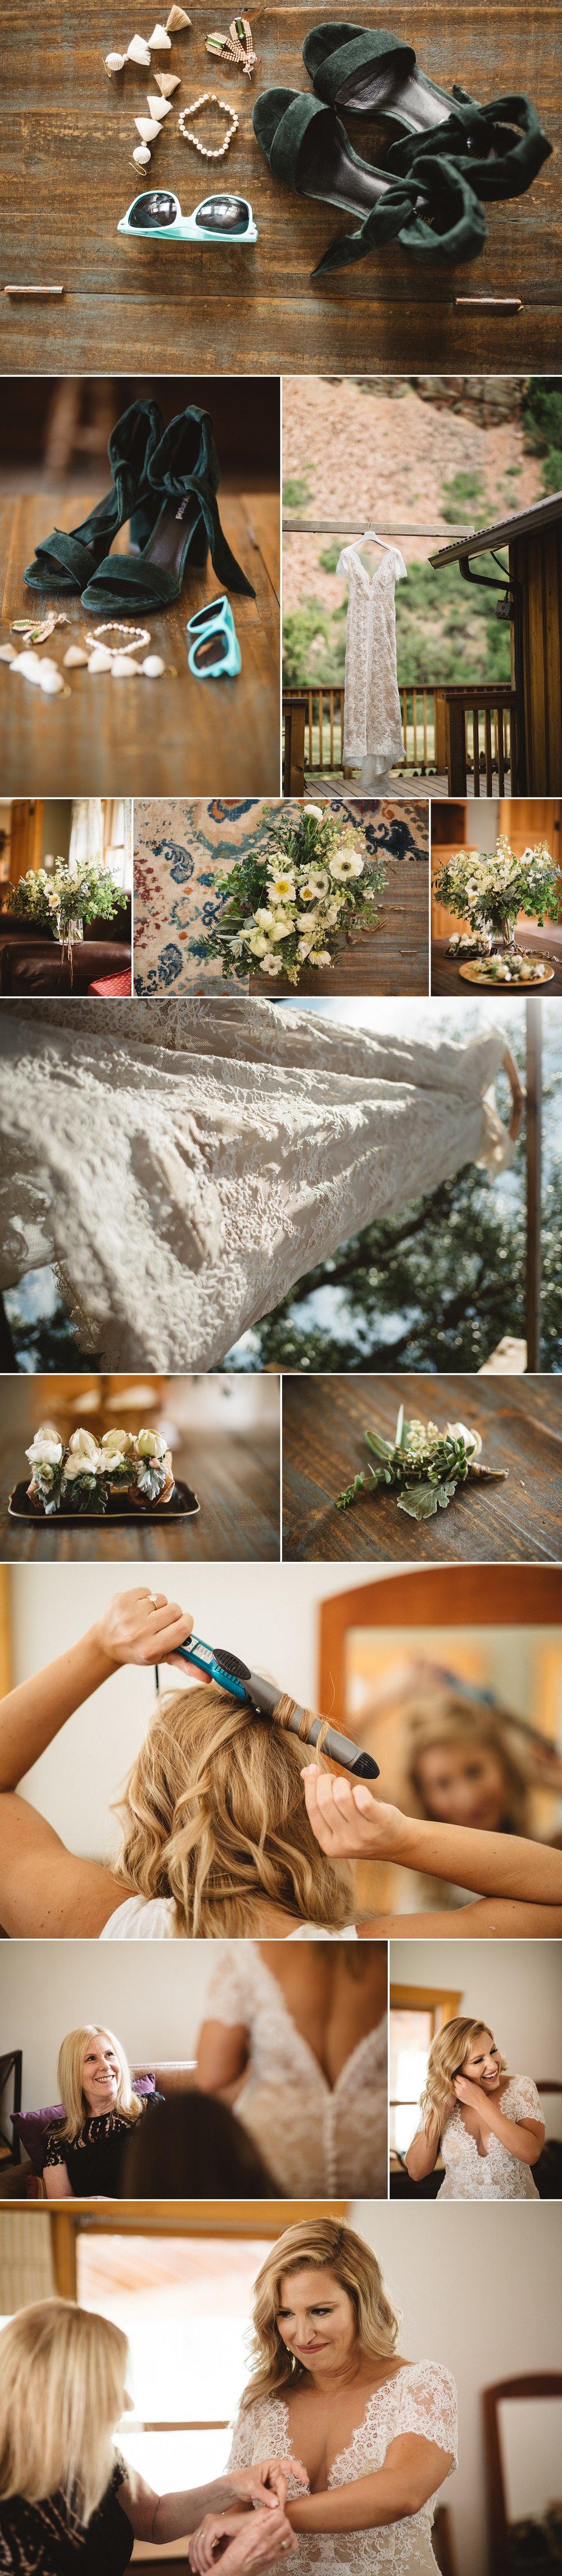 Alex+Jess-Planet-Bluegrass-Wedding-Lyons-002_WEB.jpg